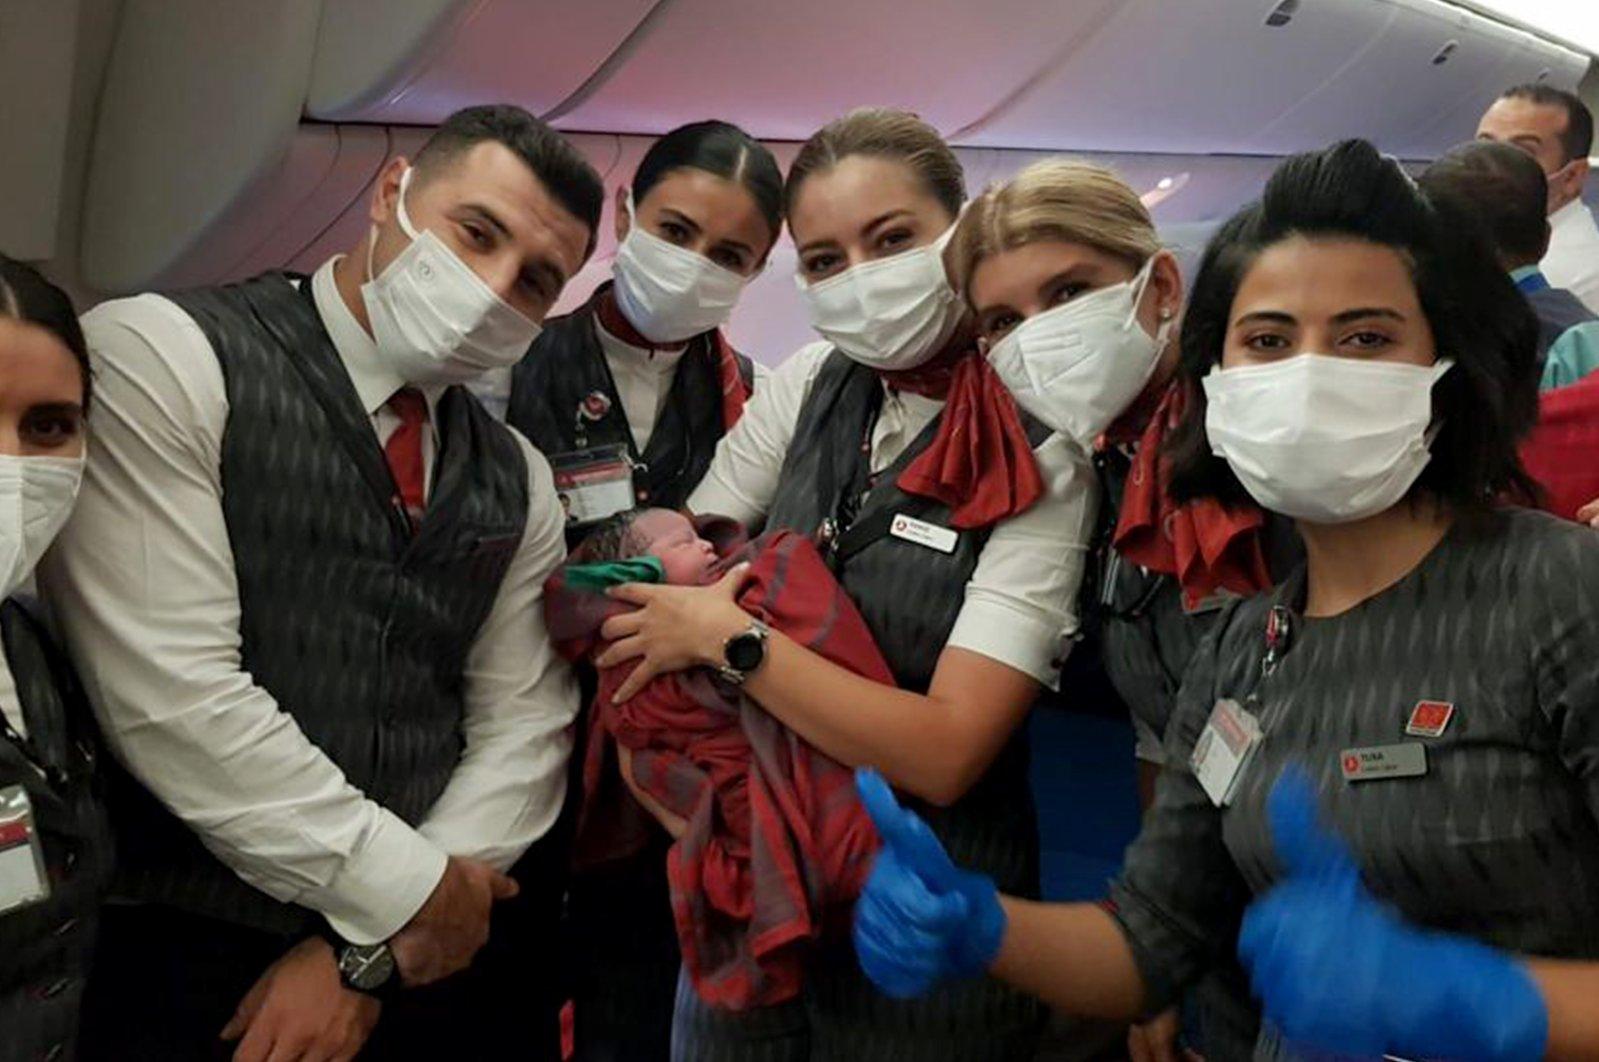 Turkish Airlines crew members hold newborn Havva during an evacuation flight from Kabul to Birmingham, Aug. 28, 2021. (AA Photo)